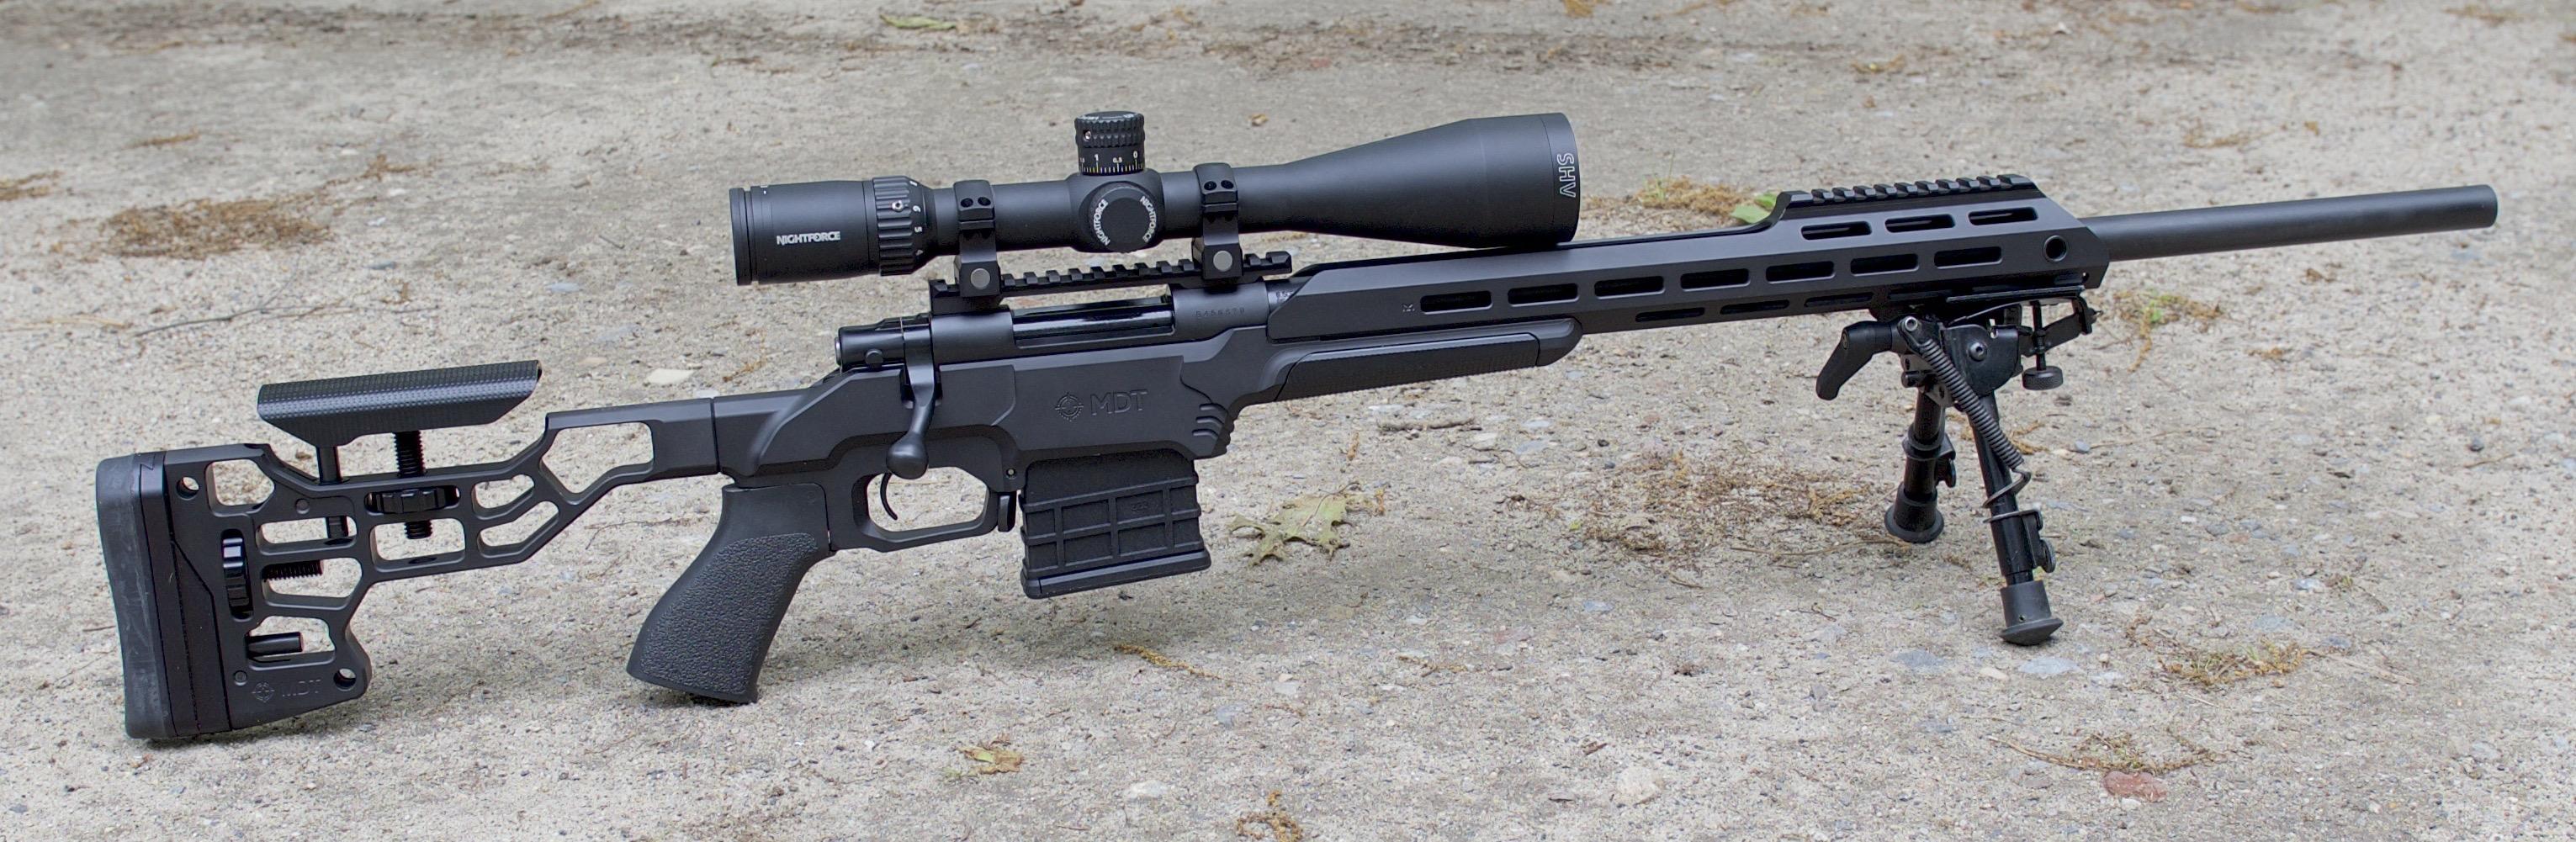 Howa 1500 Mdt Ess Chassis 6 5 Creed 12 Rifleshooter Com